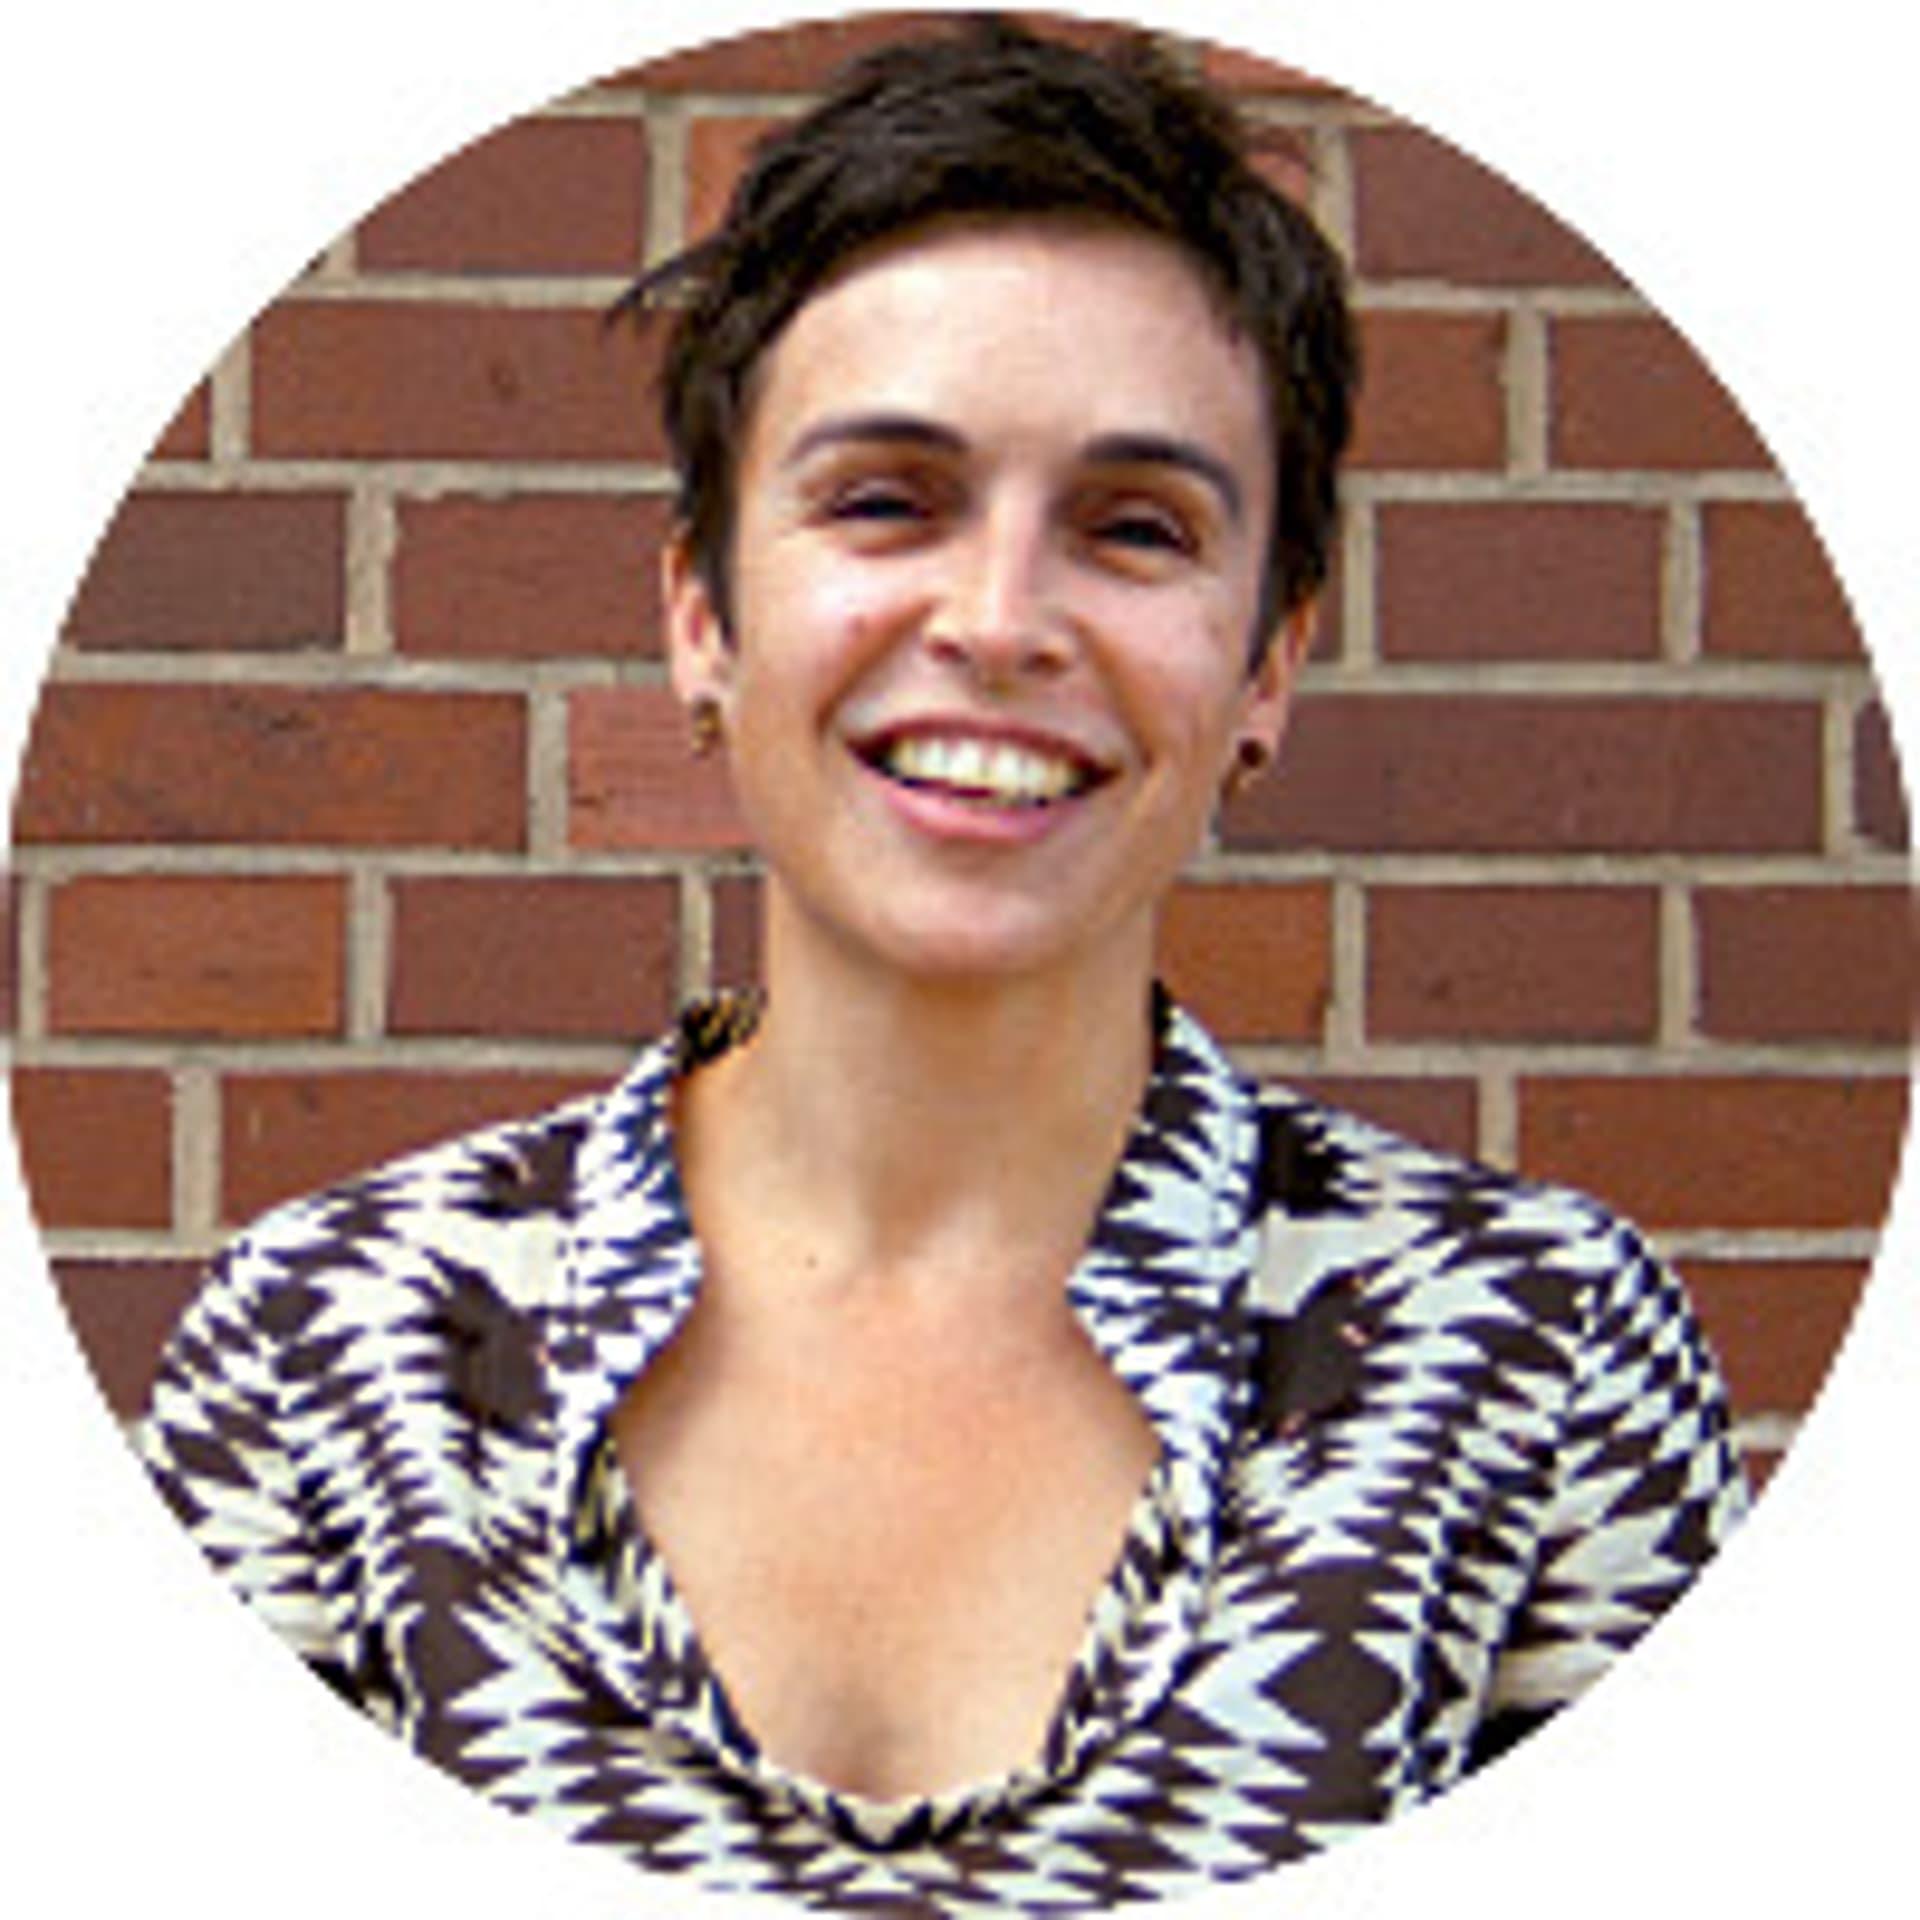 Joana Breitenbach